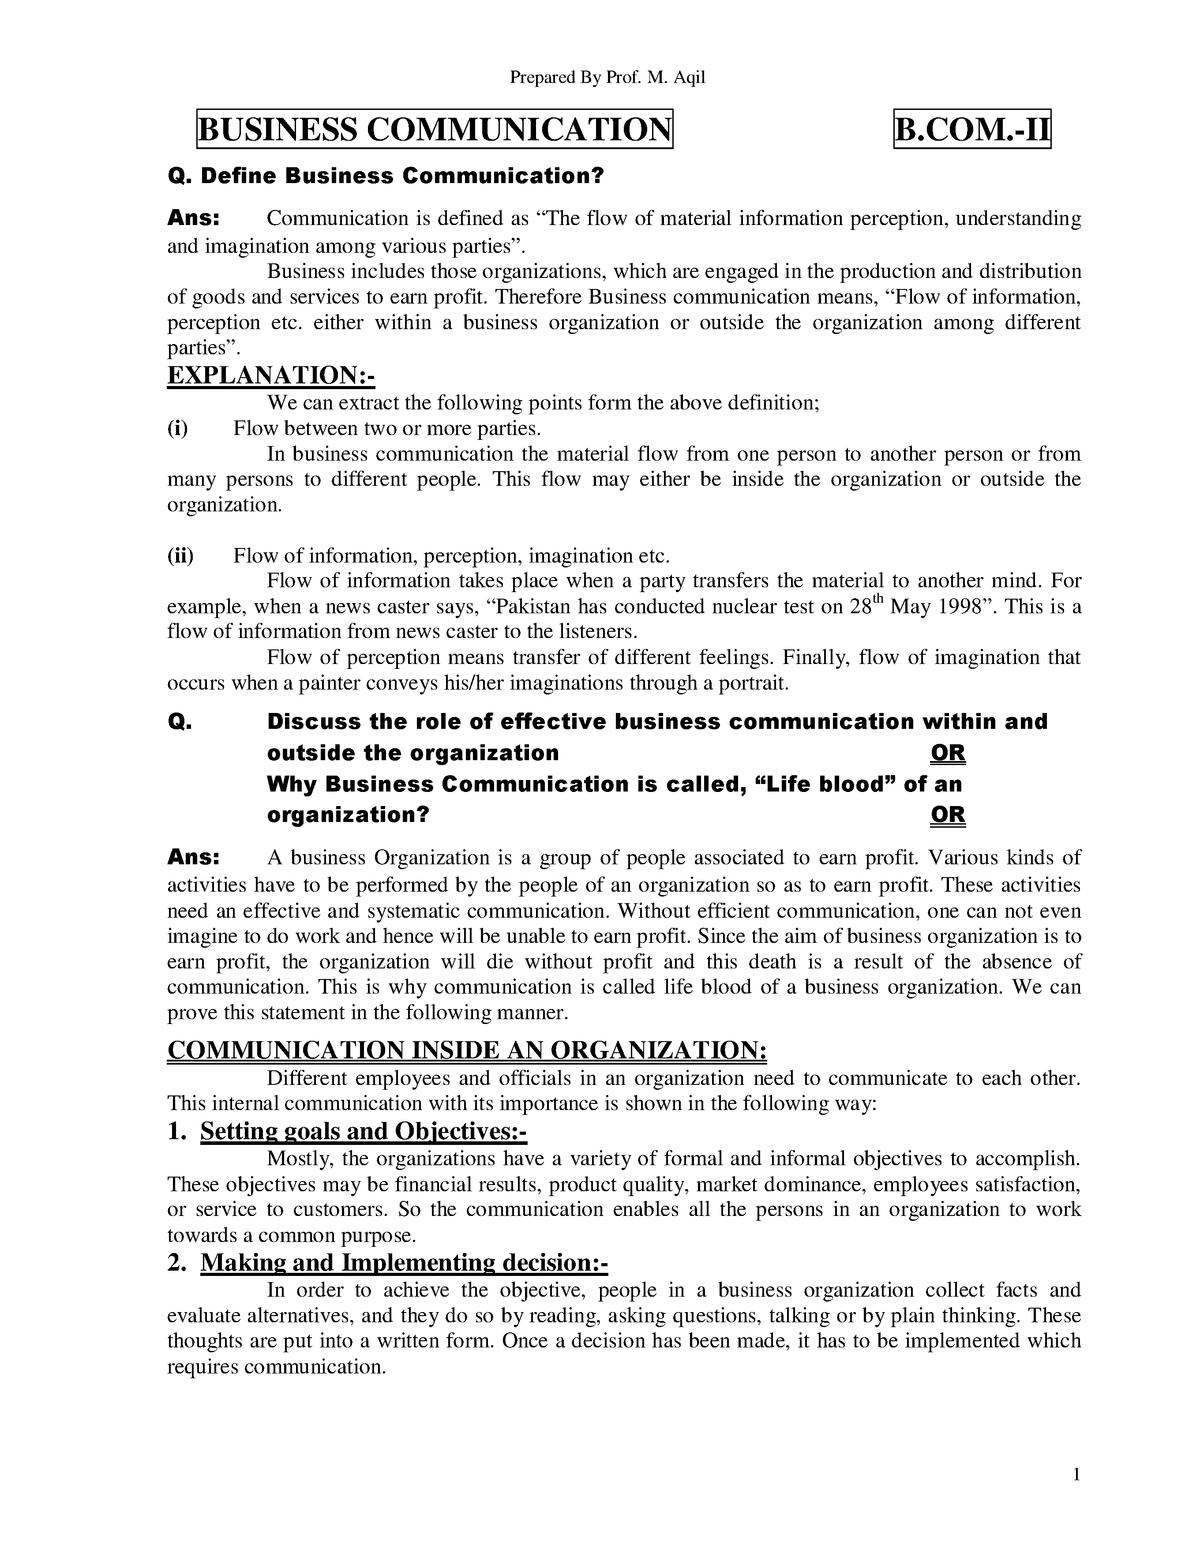 Business-communication - Bpbe 347 3 - U of S - StuDocu